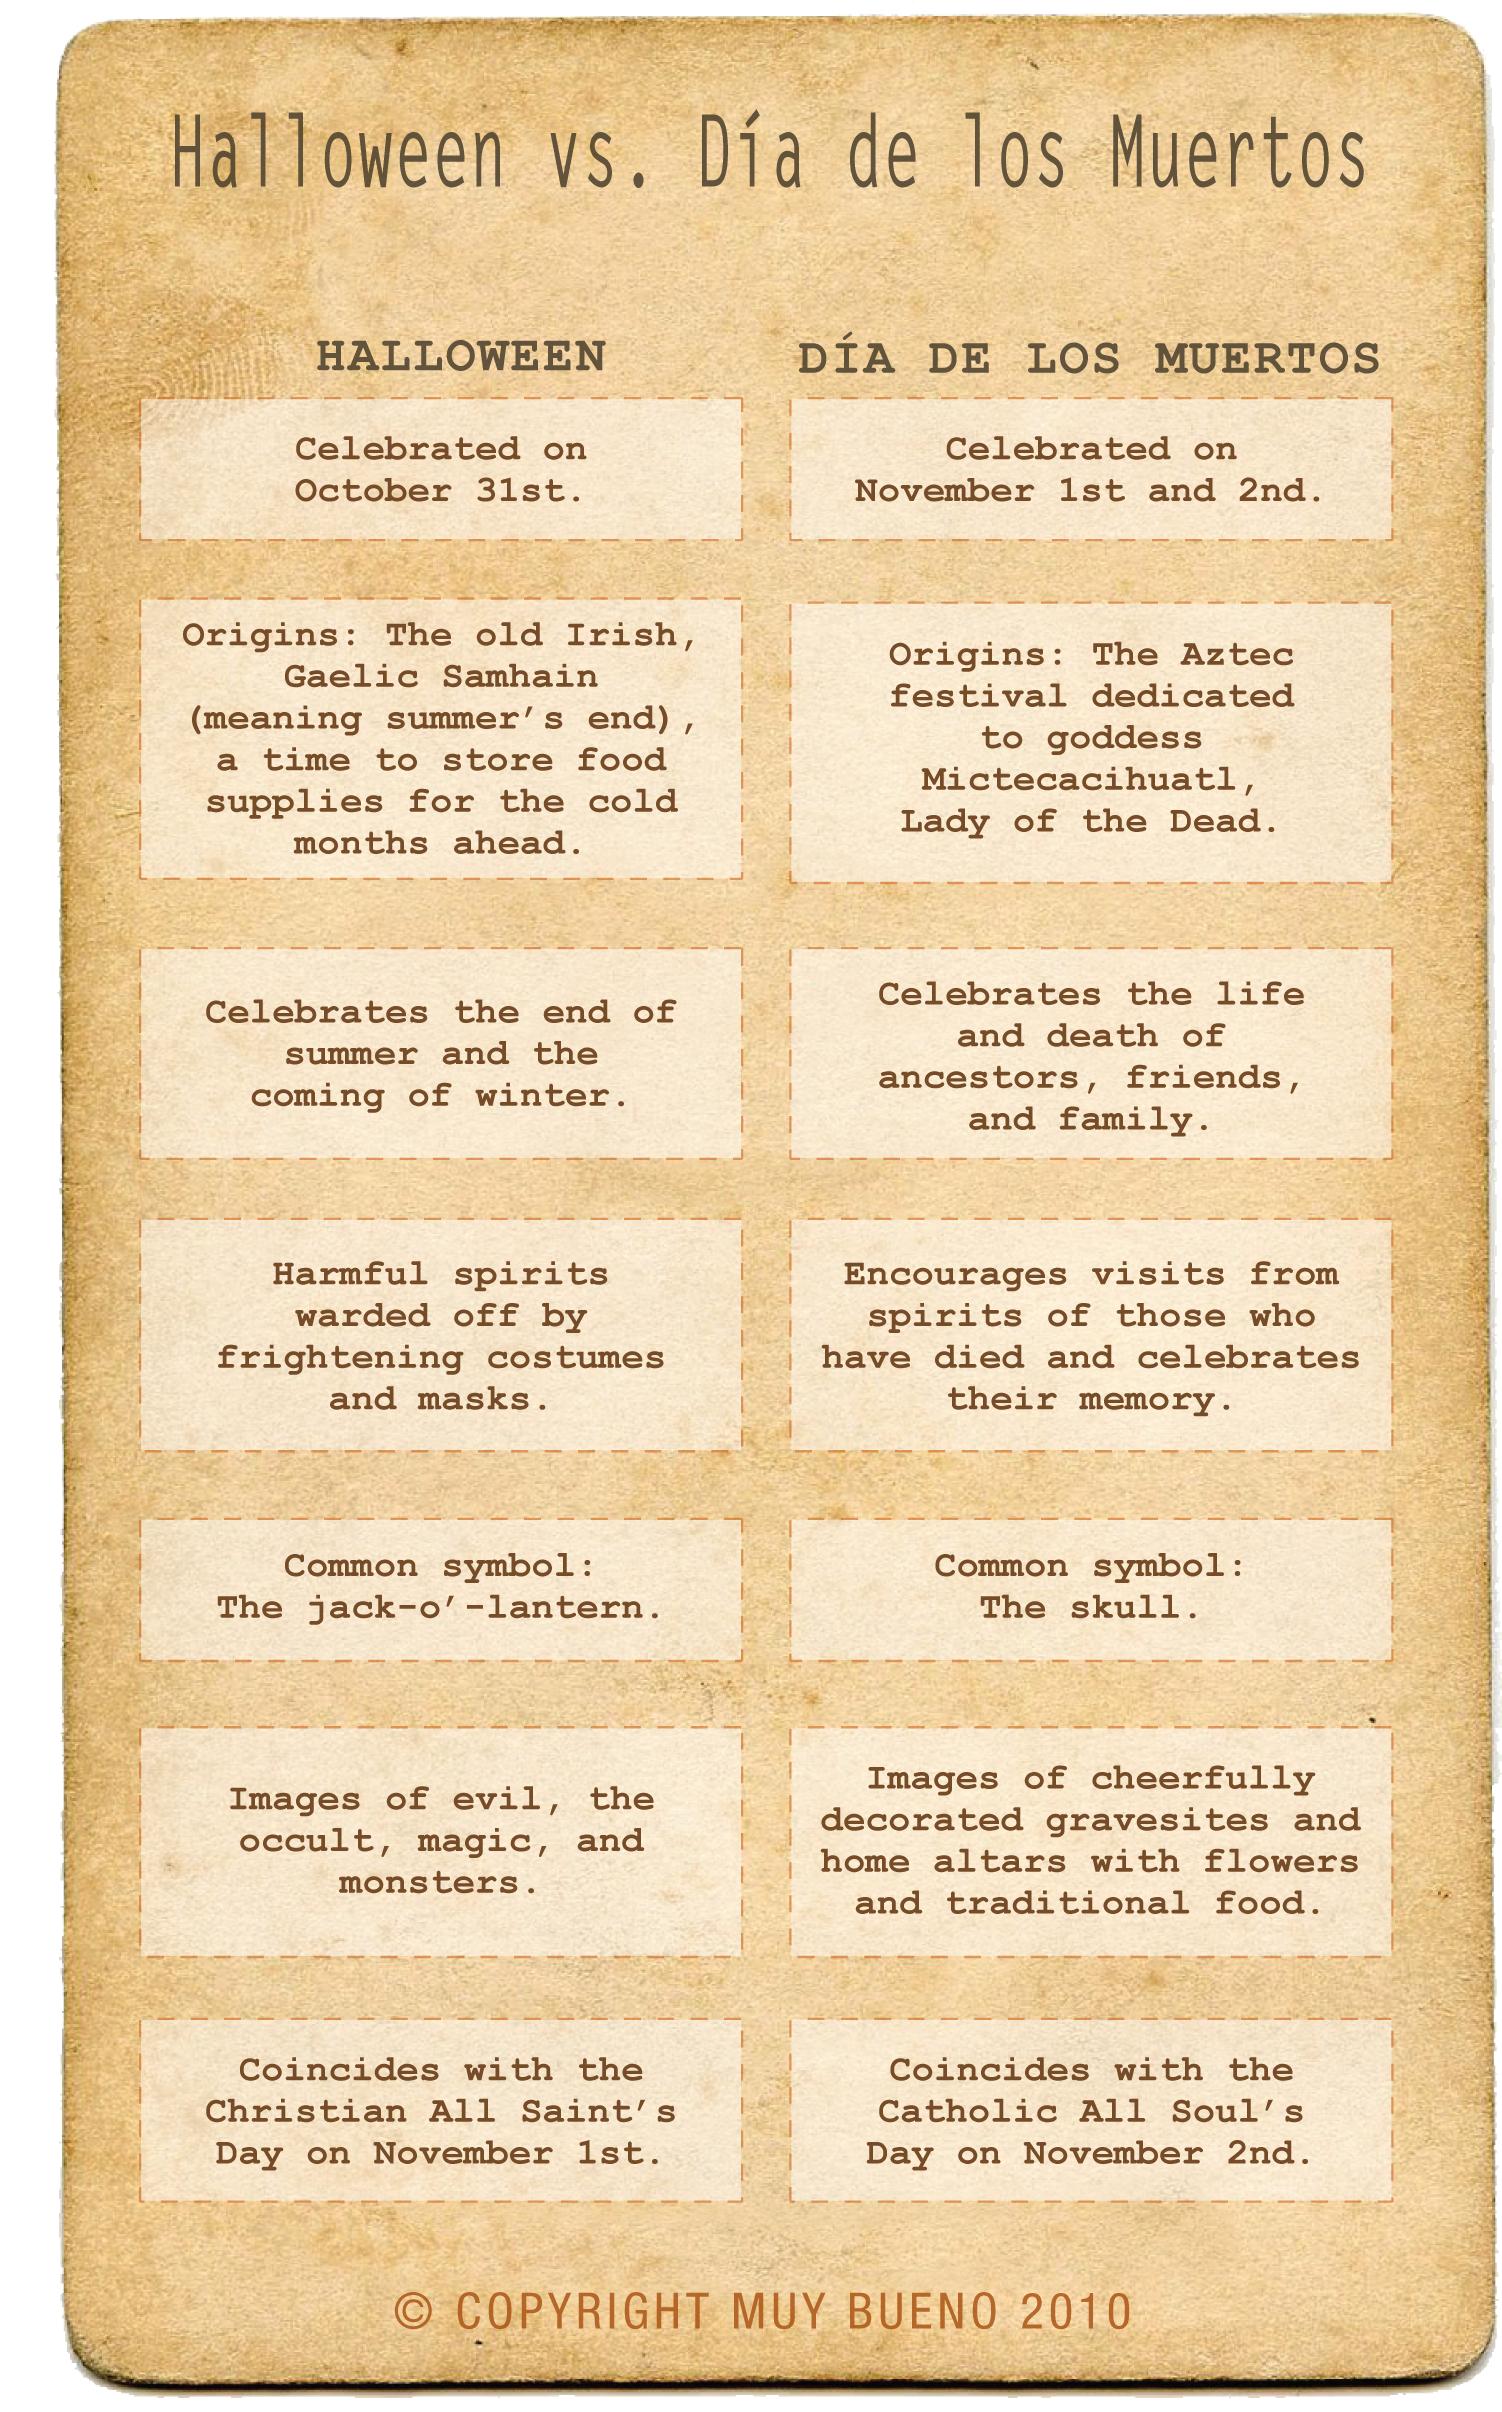 Halloween vs. Dia de los Muertos infographic